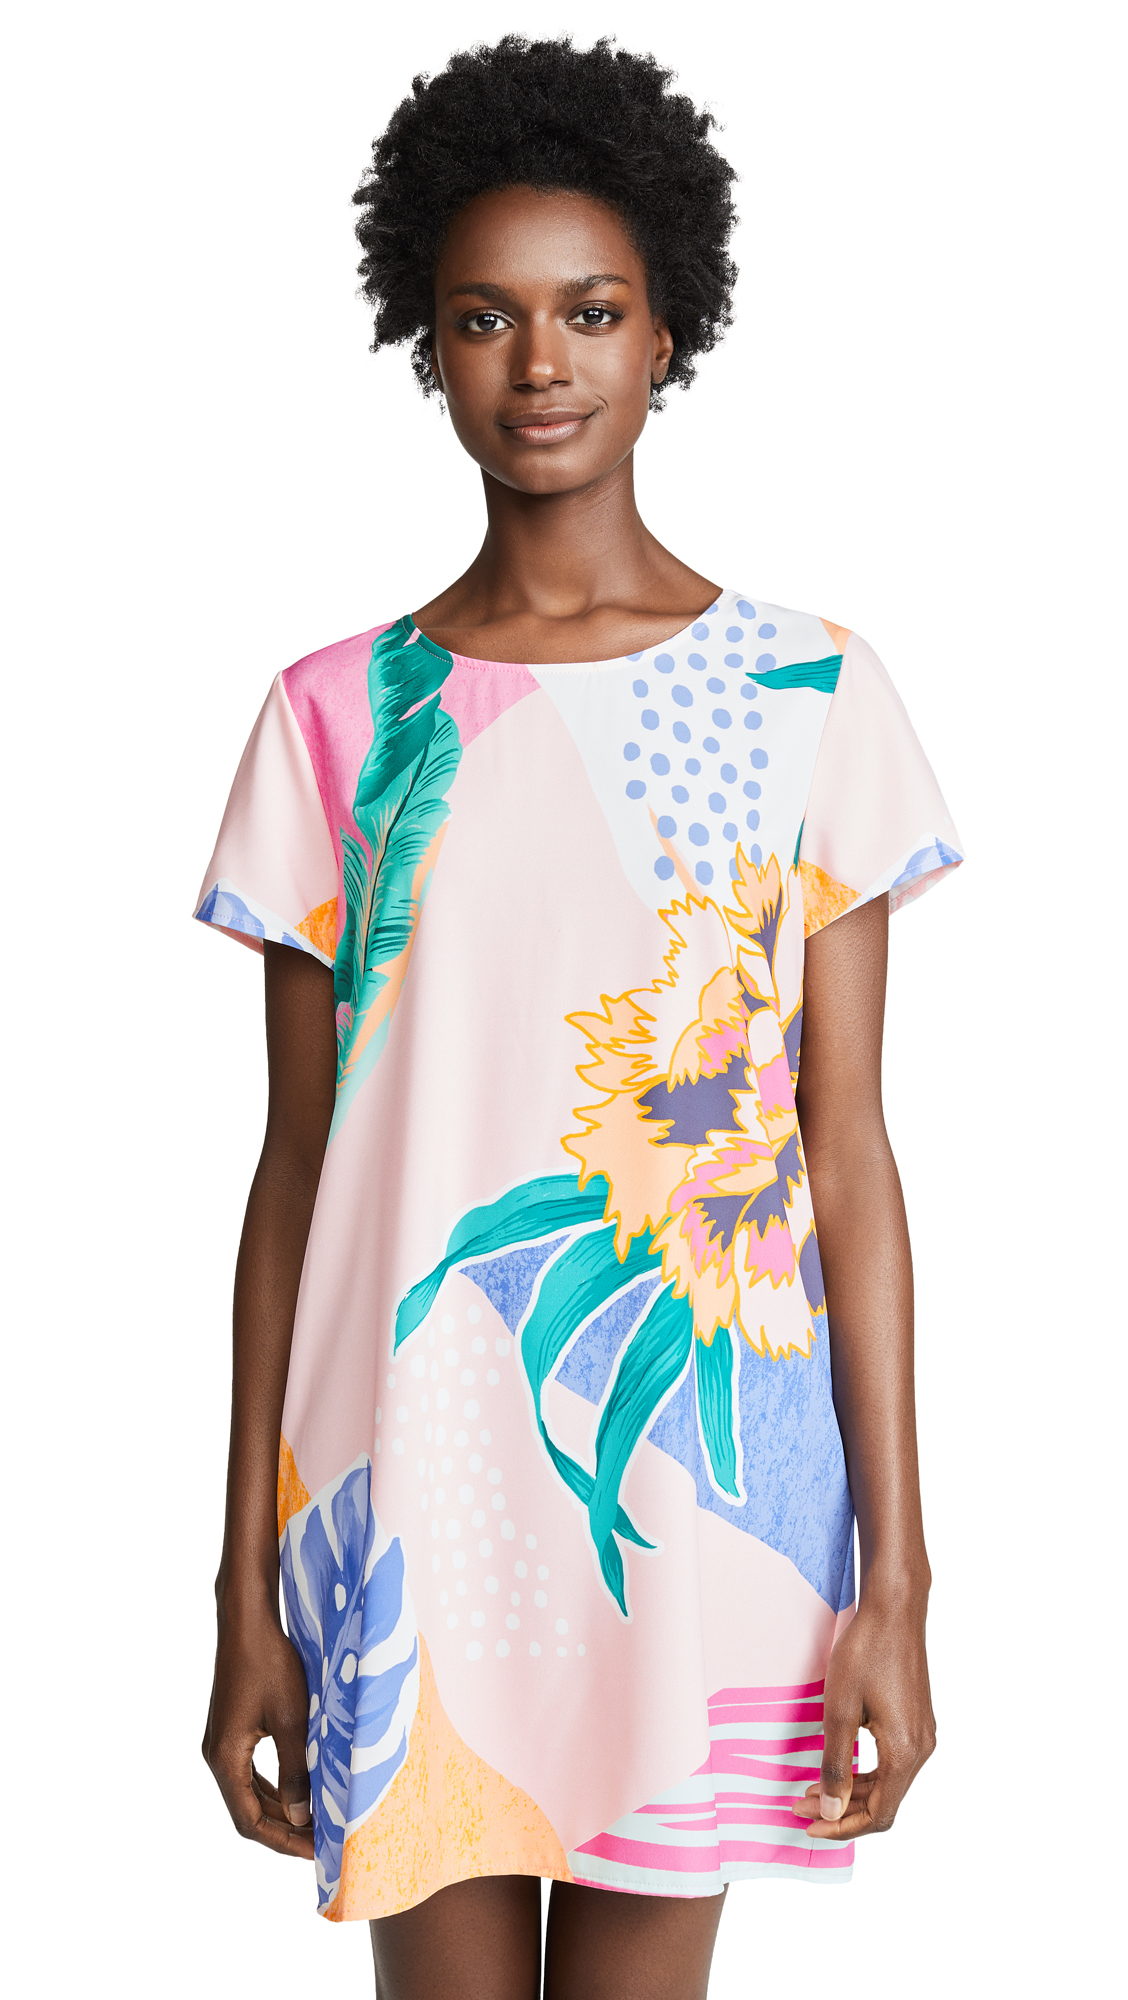 MINKPINK Idea of Happiness Tee Dress